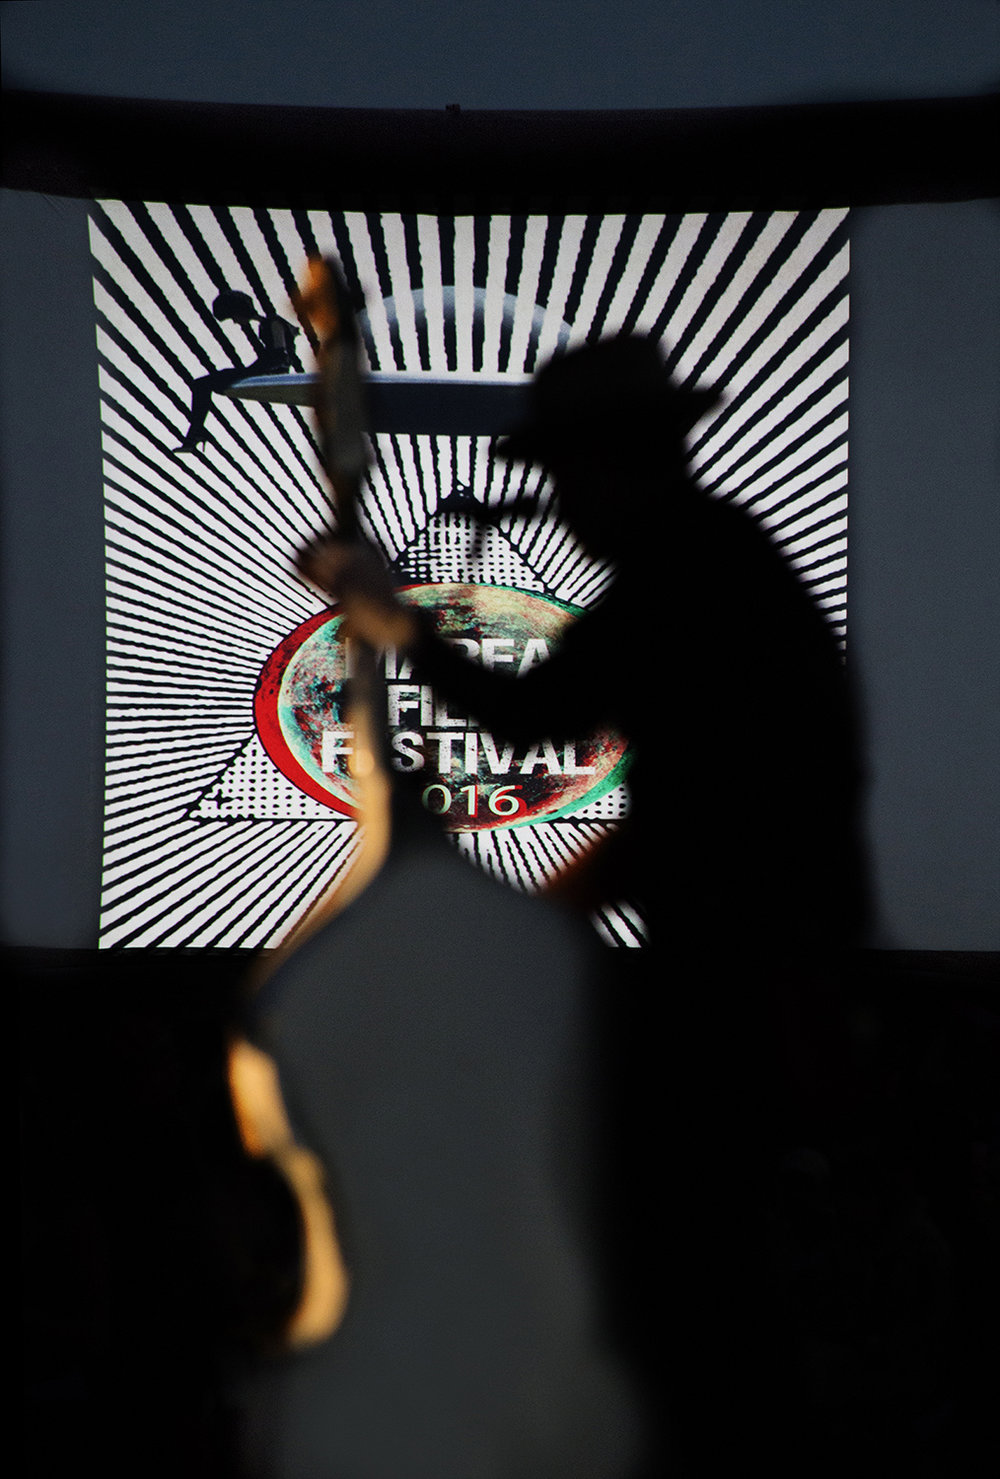 Marfa Film Festival